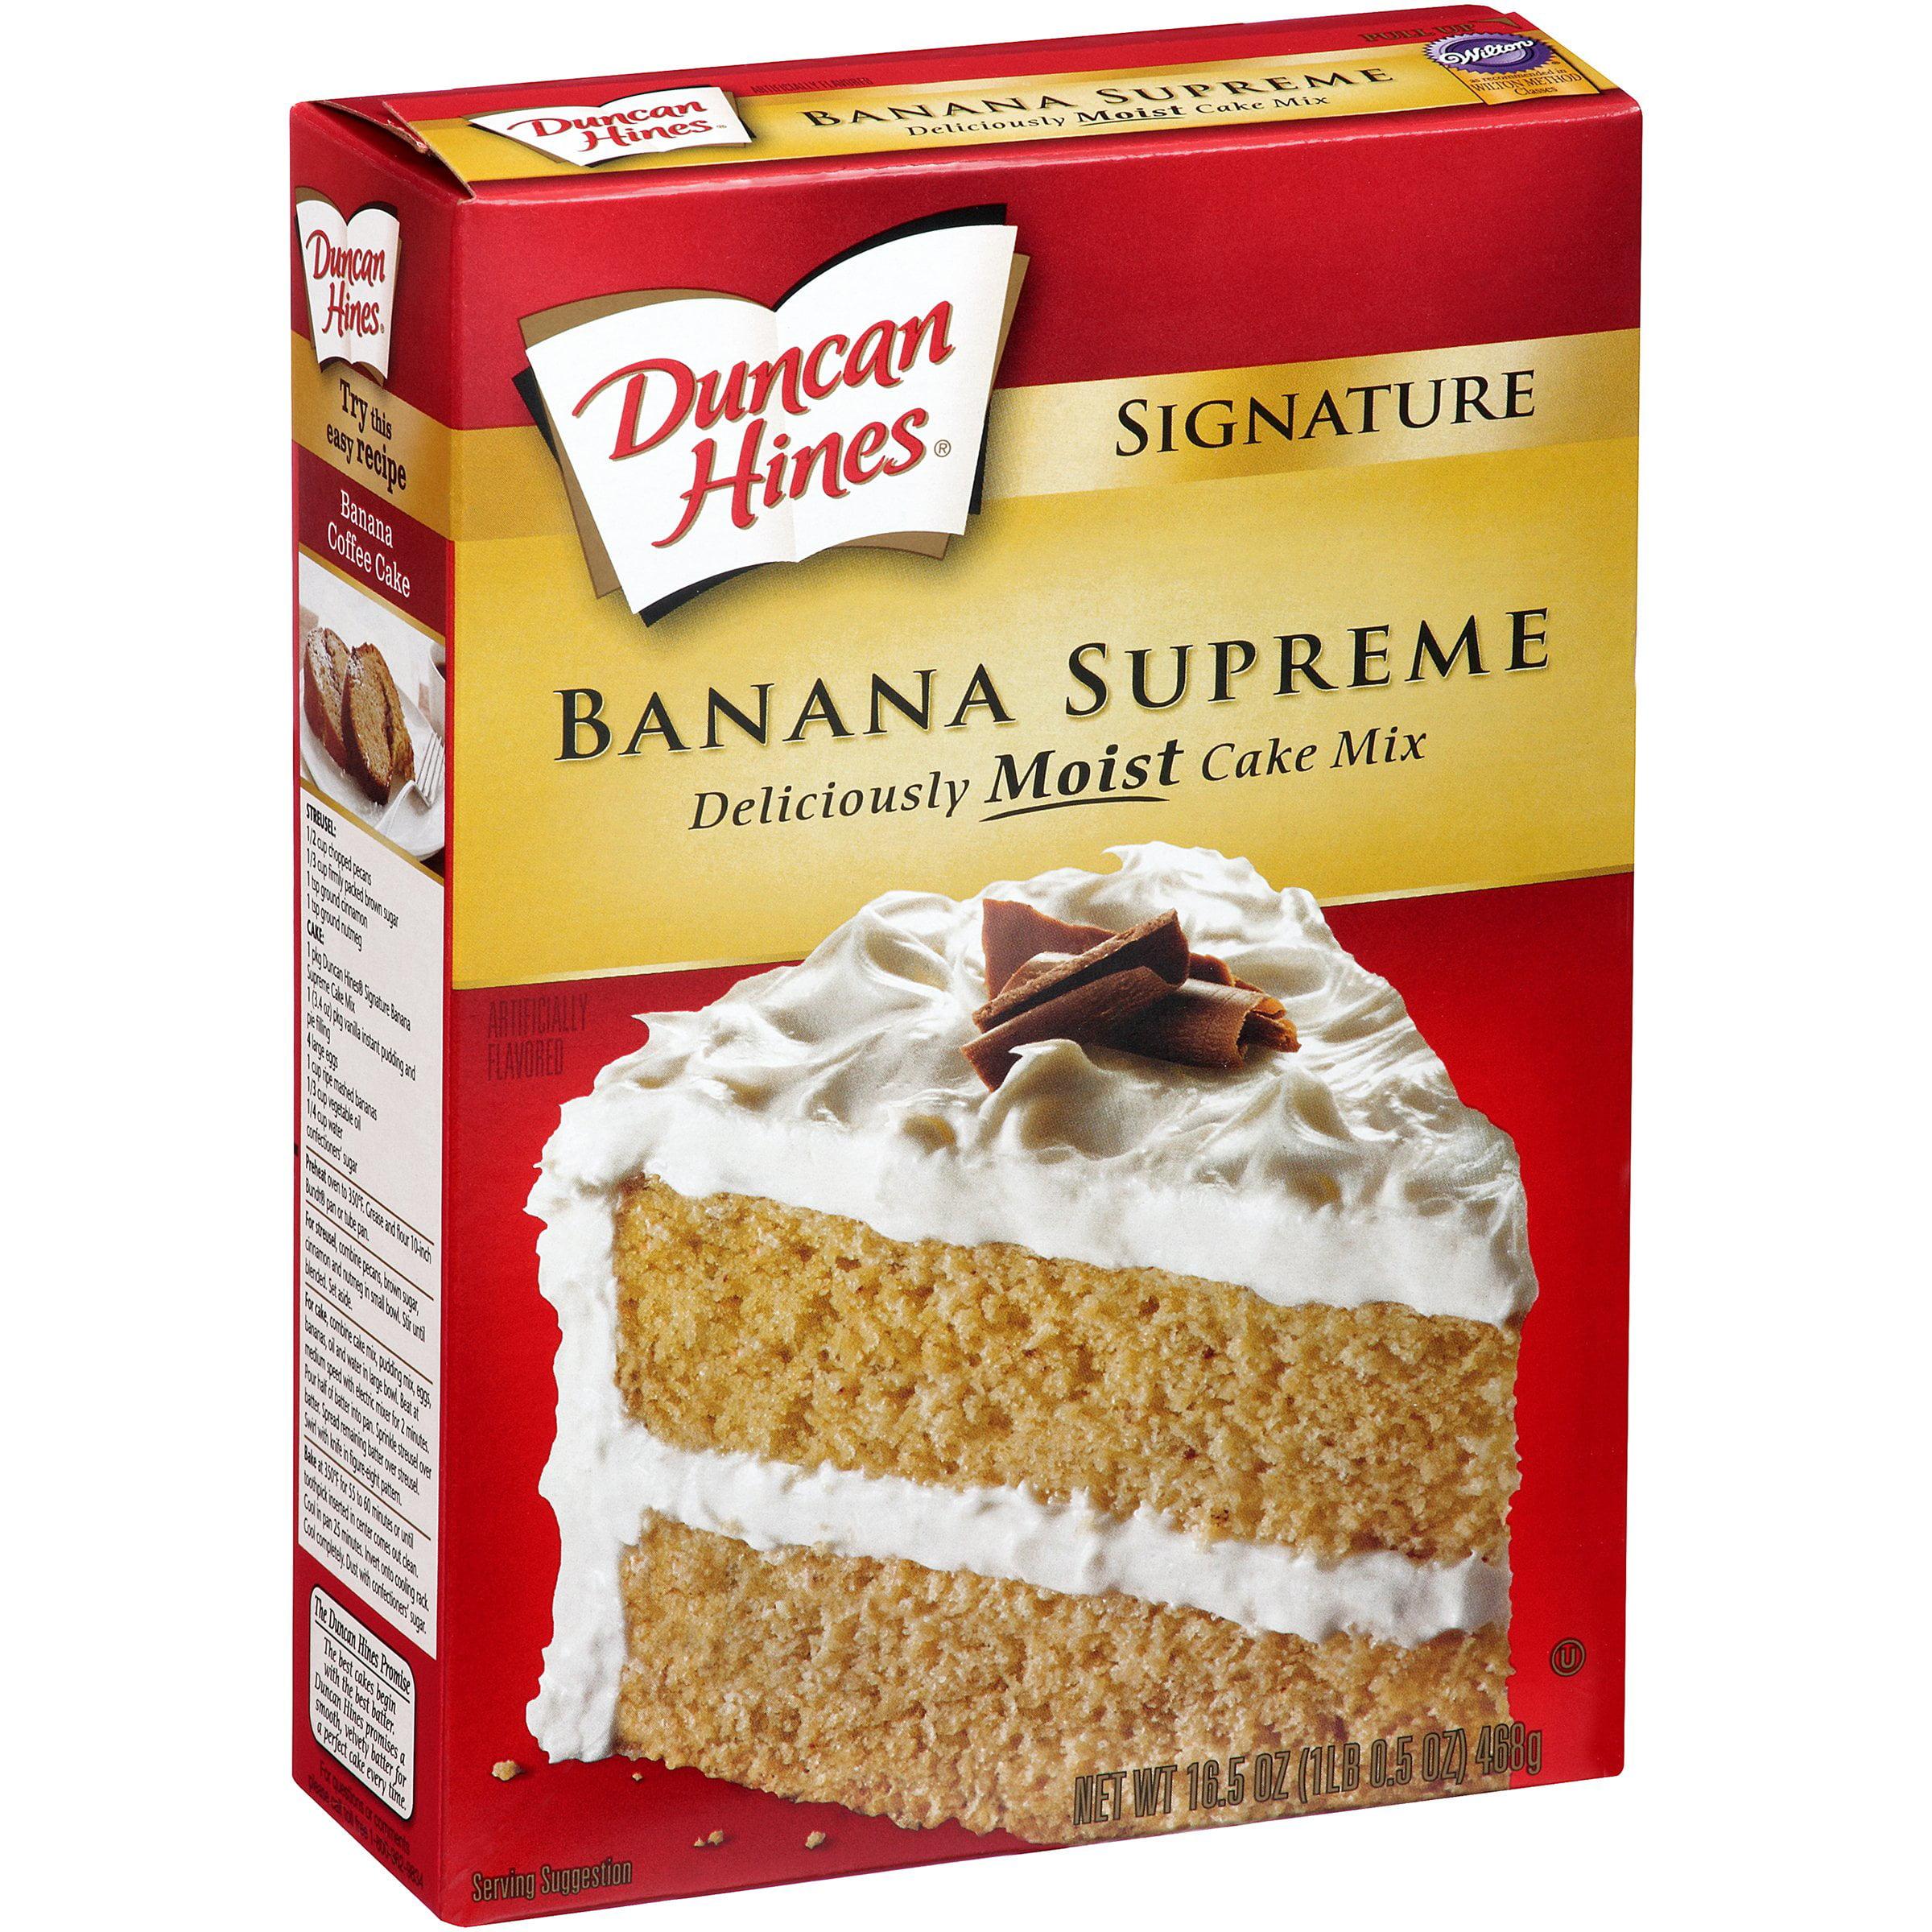 Duncan Hines Signature Banana Supreme Cake Mix 16.5 oz. Box by Pinnacle Foods Group, Llc